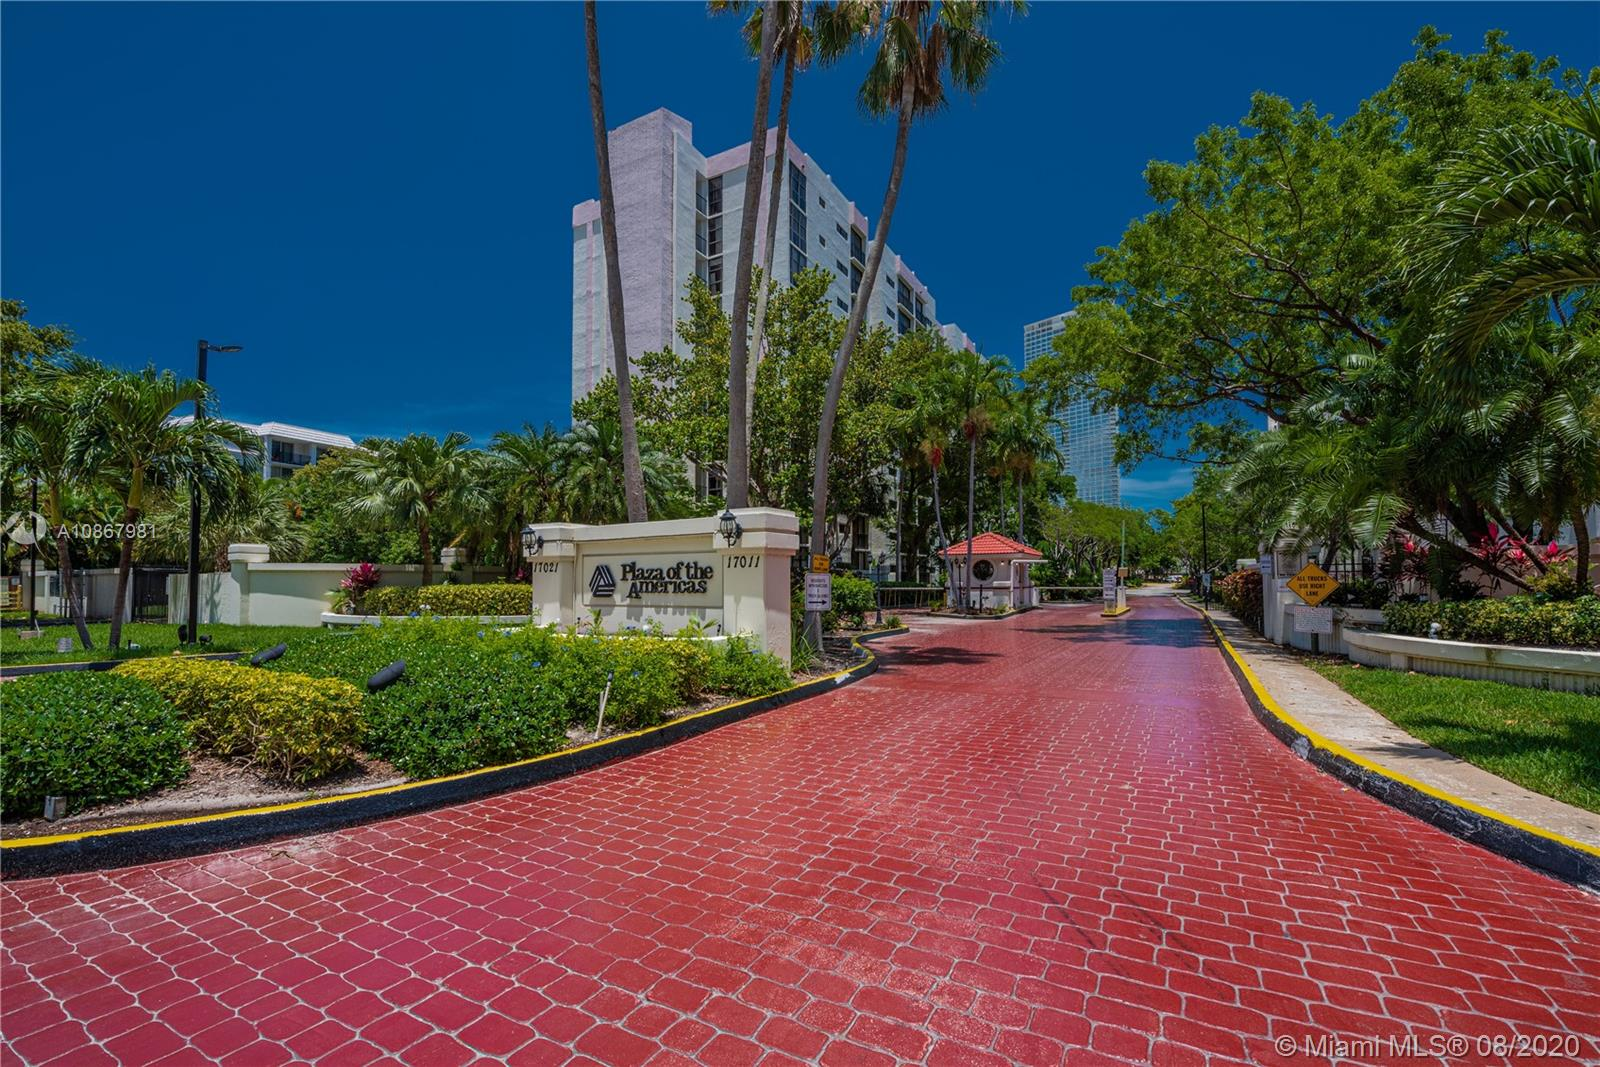 Plaza of the Americas 4 #812 - 17021 N Bay Rd #812, Sunny Isles Beach, FL 33160